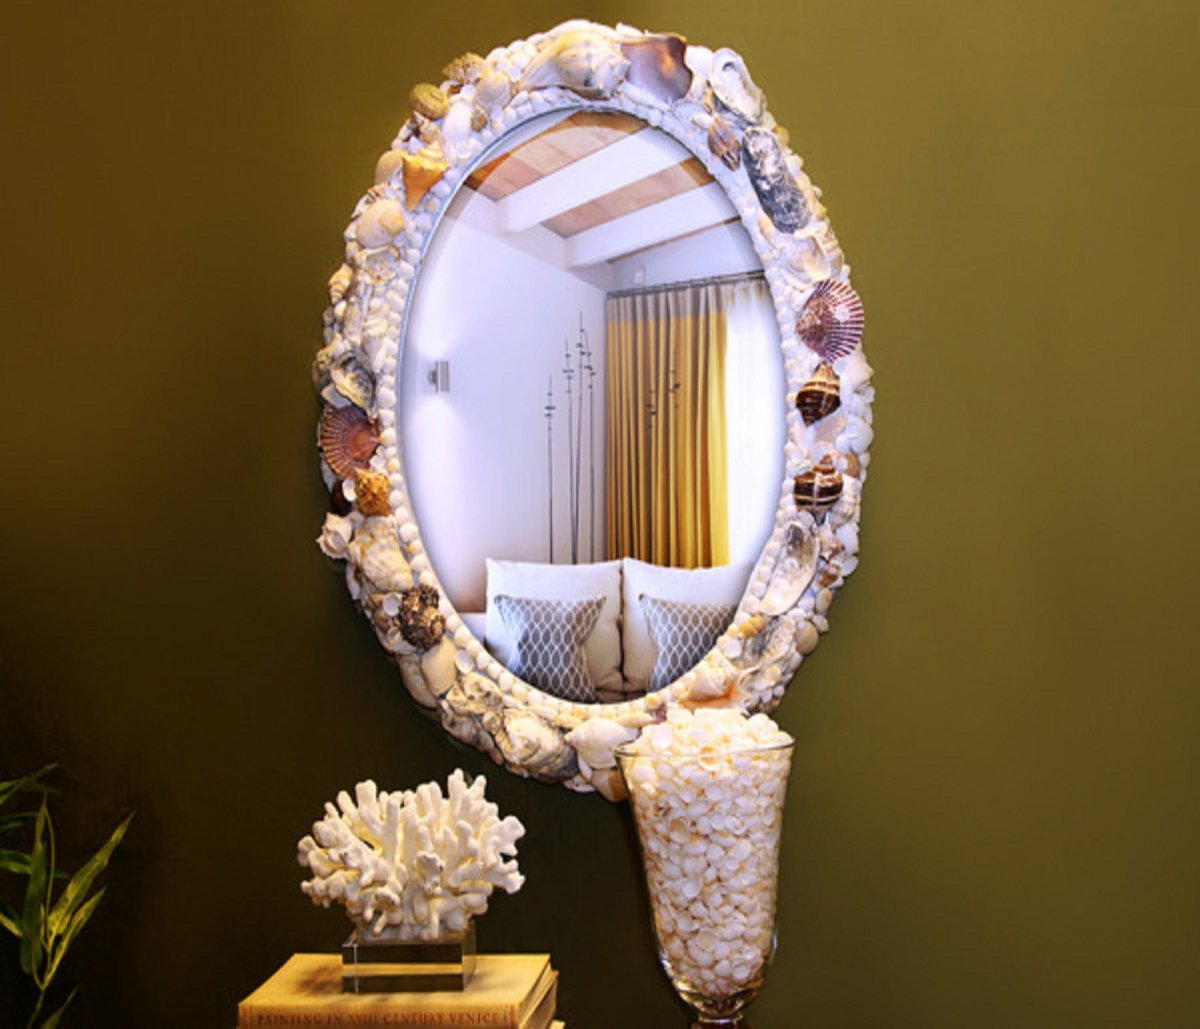 creative handmade mirrors - HD2100×1800